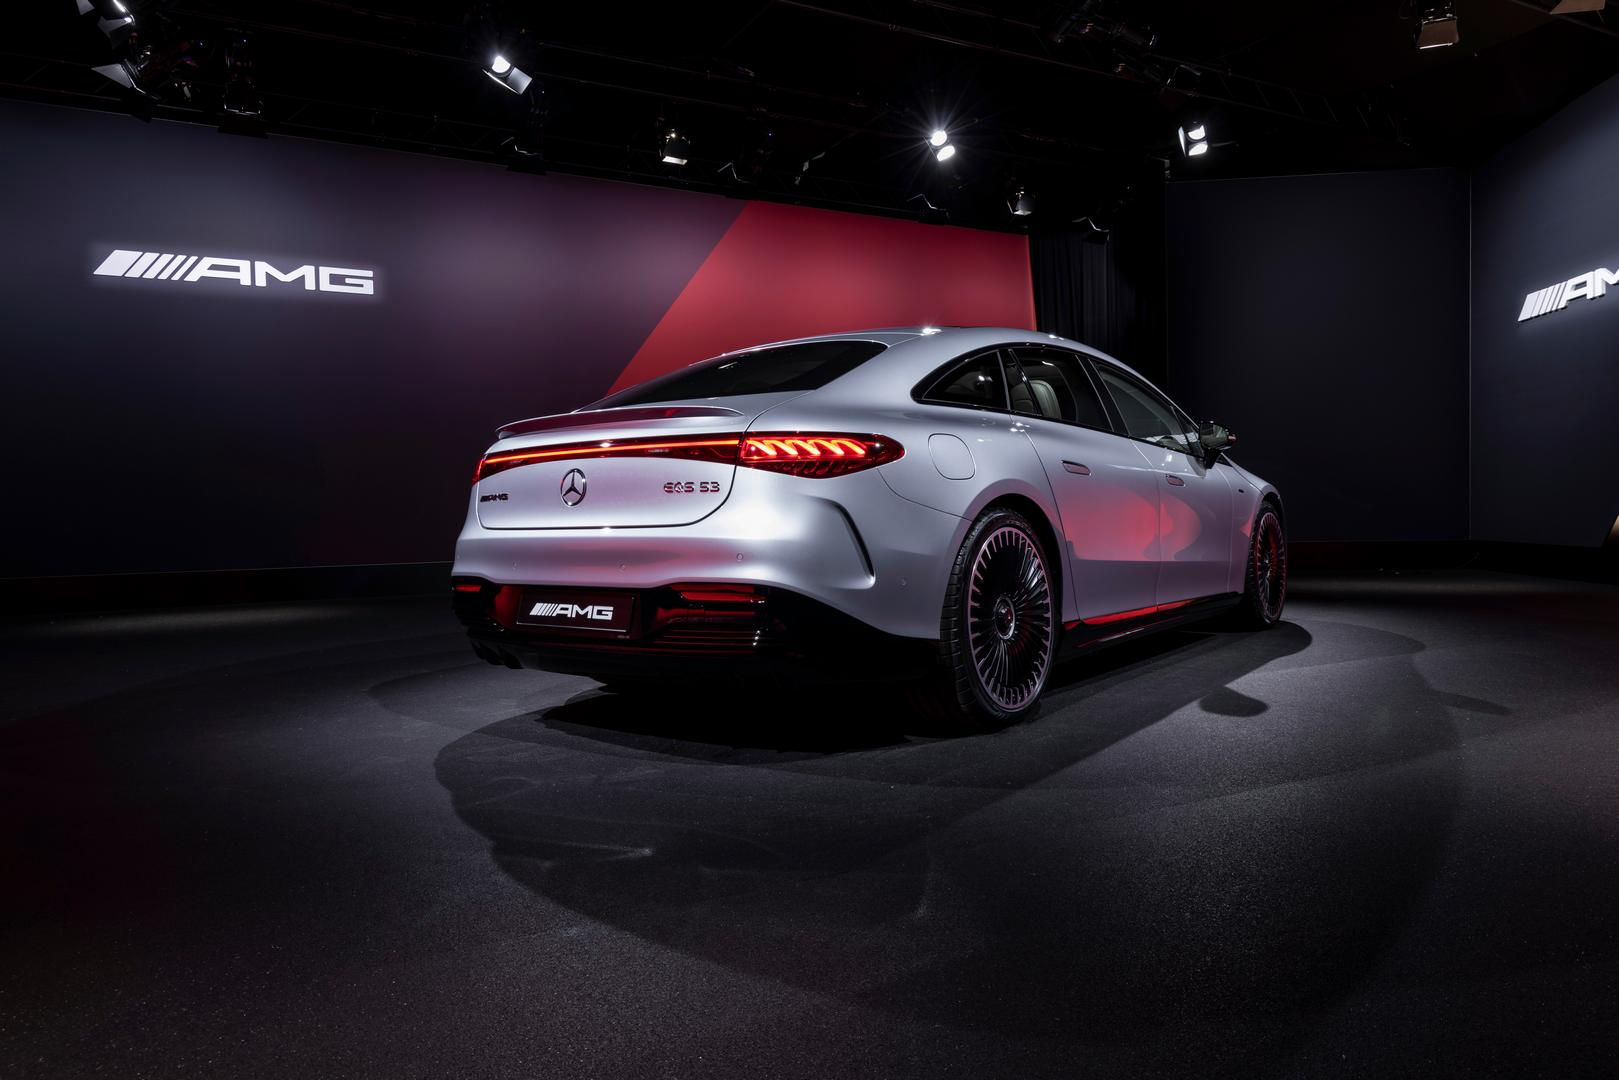 Mercedes-AMG EQS 53 4MATIC+, 2021Mercedes-AMG EQS 53 taillights